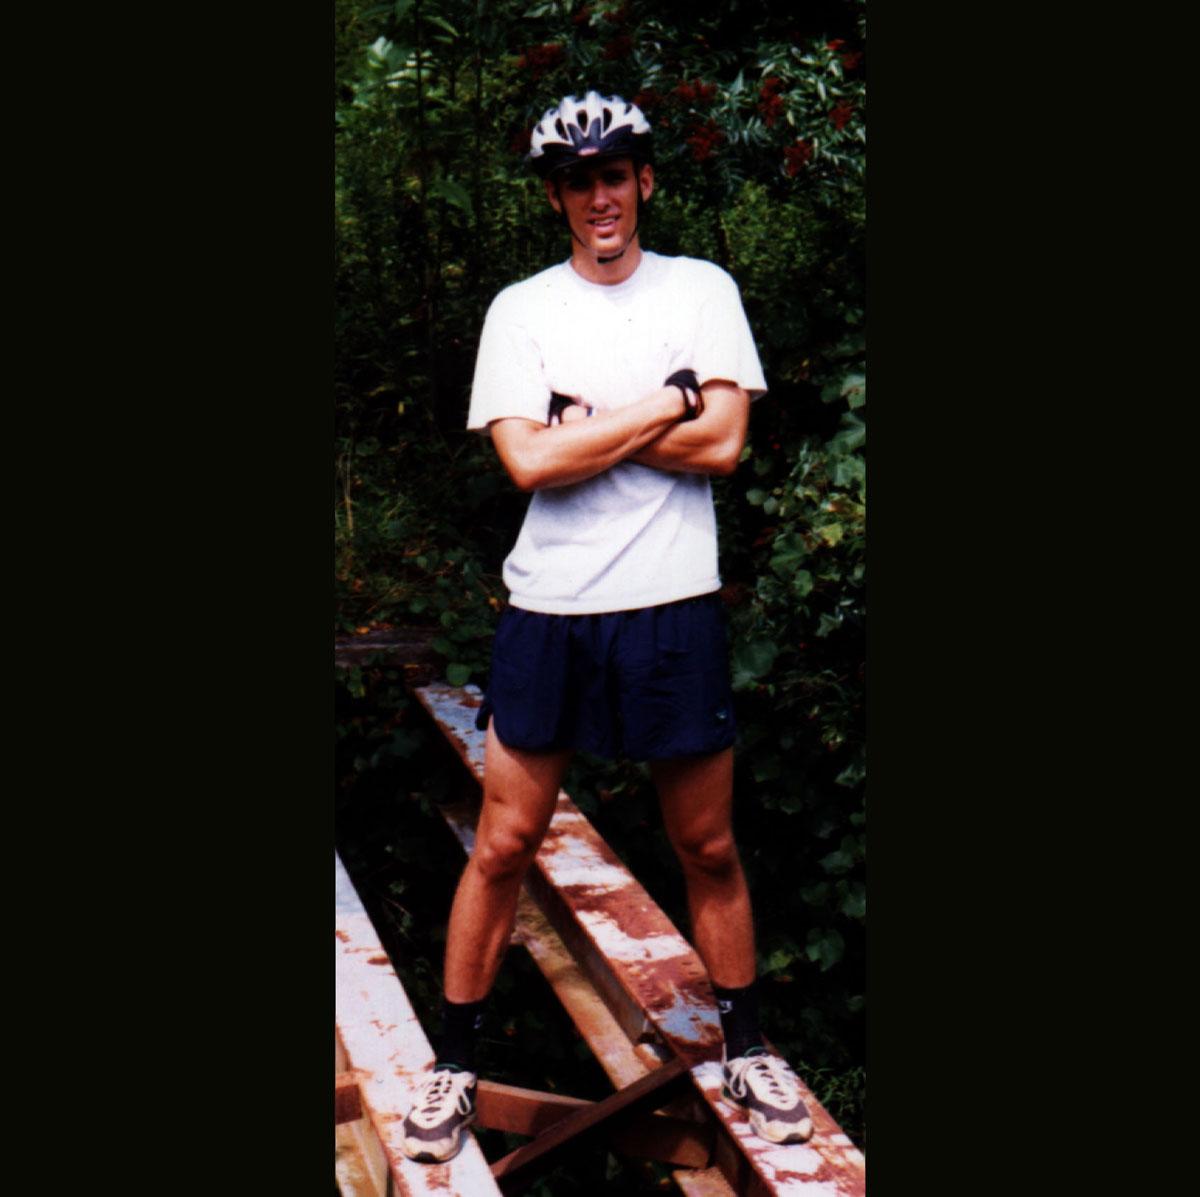 c8417189 Why I Quit Mountain Biking - Singletracks Mountain Bike News